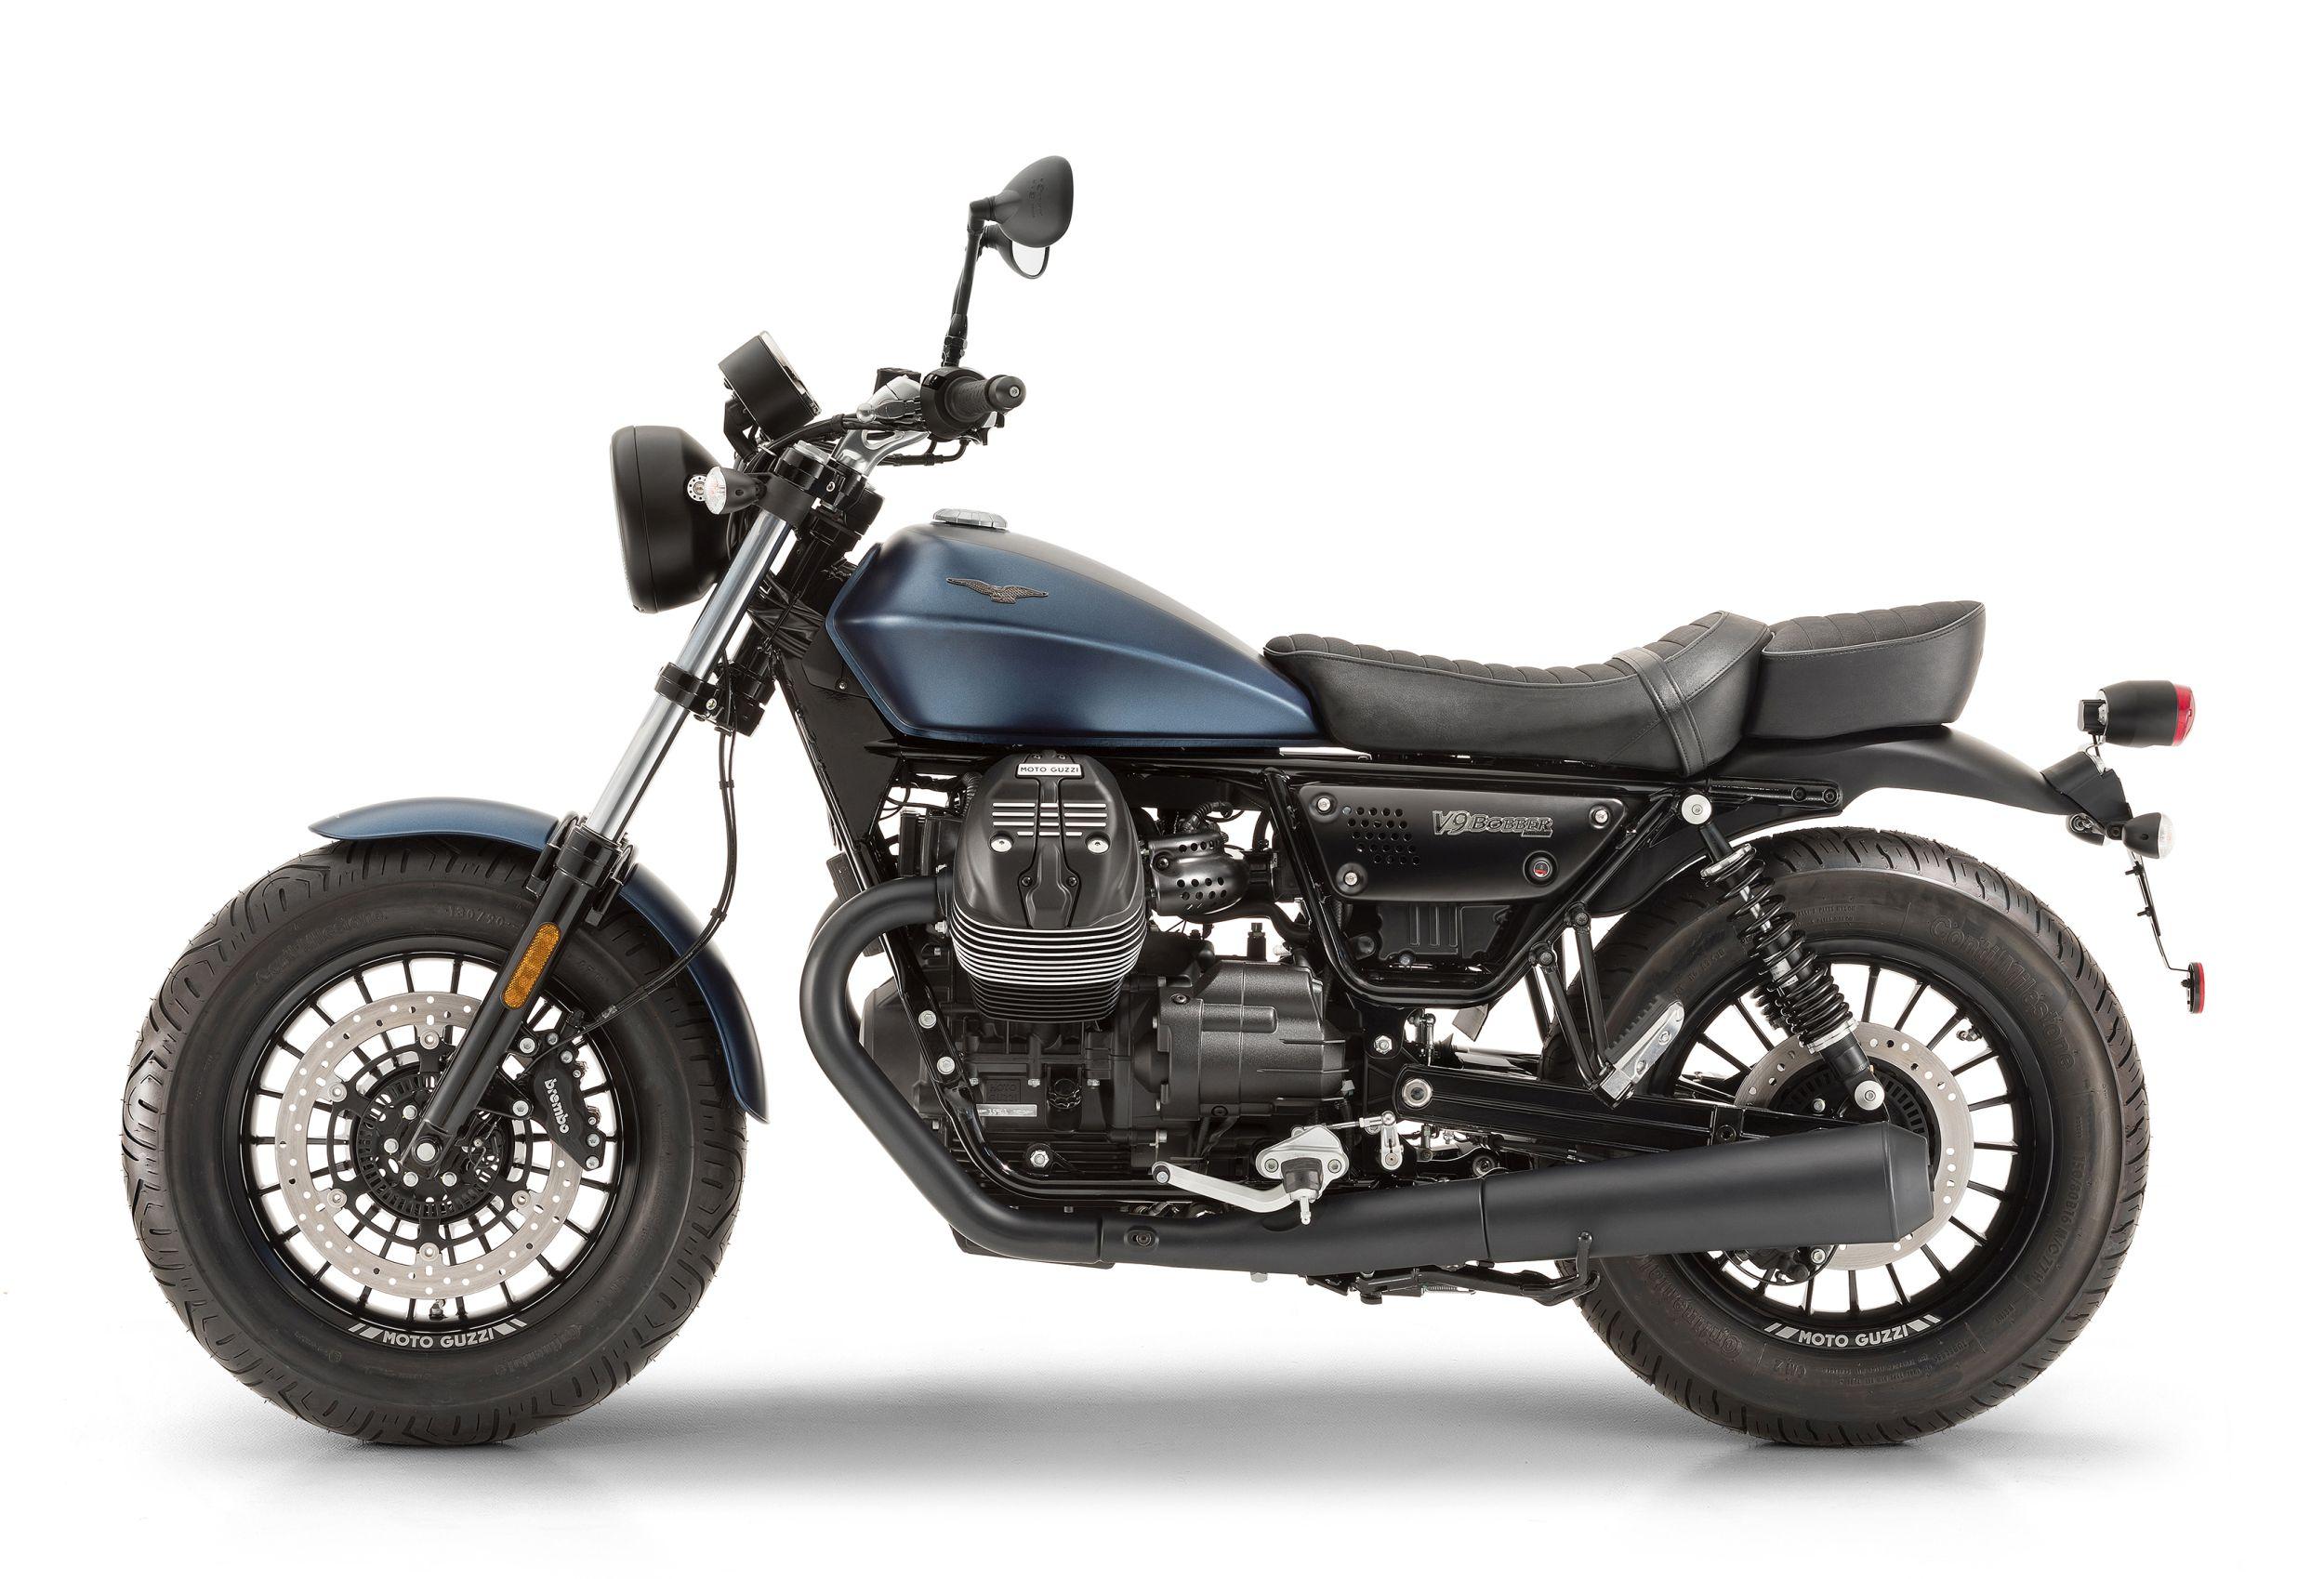 moto guzzi v9 bobber sport zweirad loitz. Black Bedroom Furniture Sets. Home Design Ideas